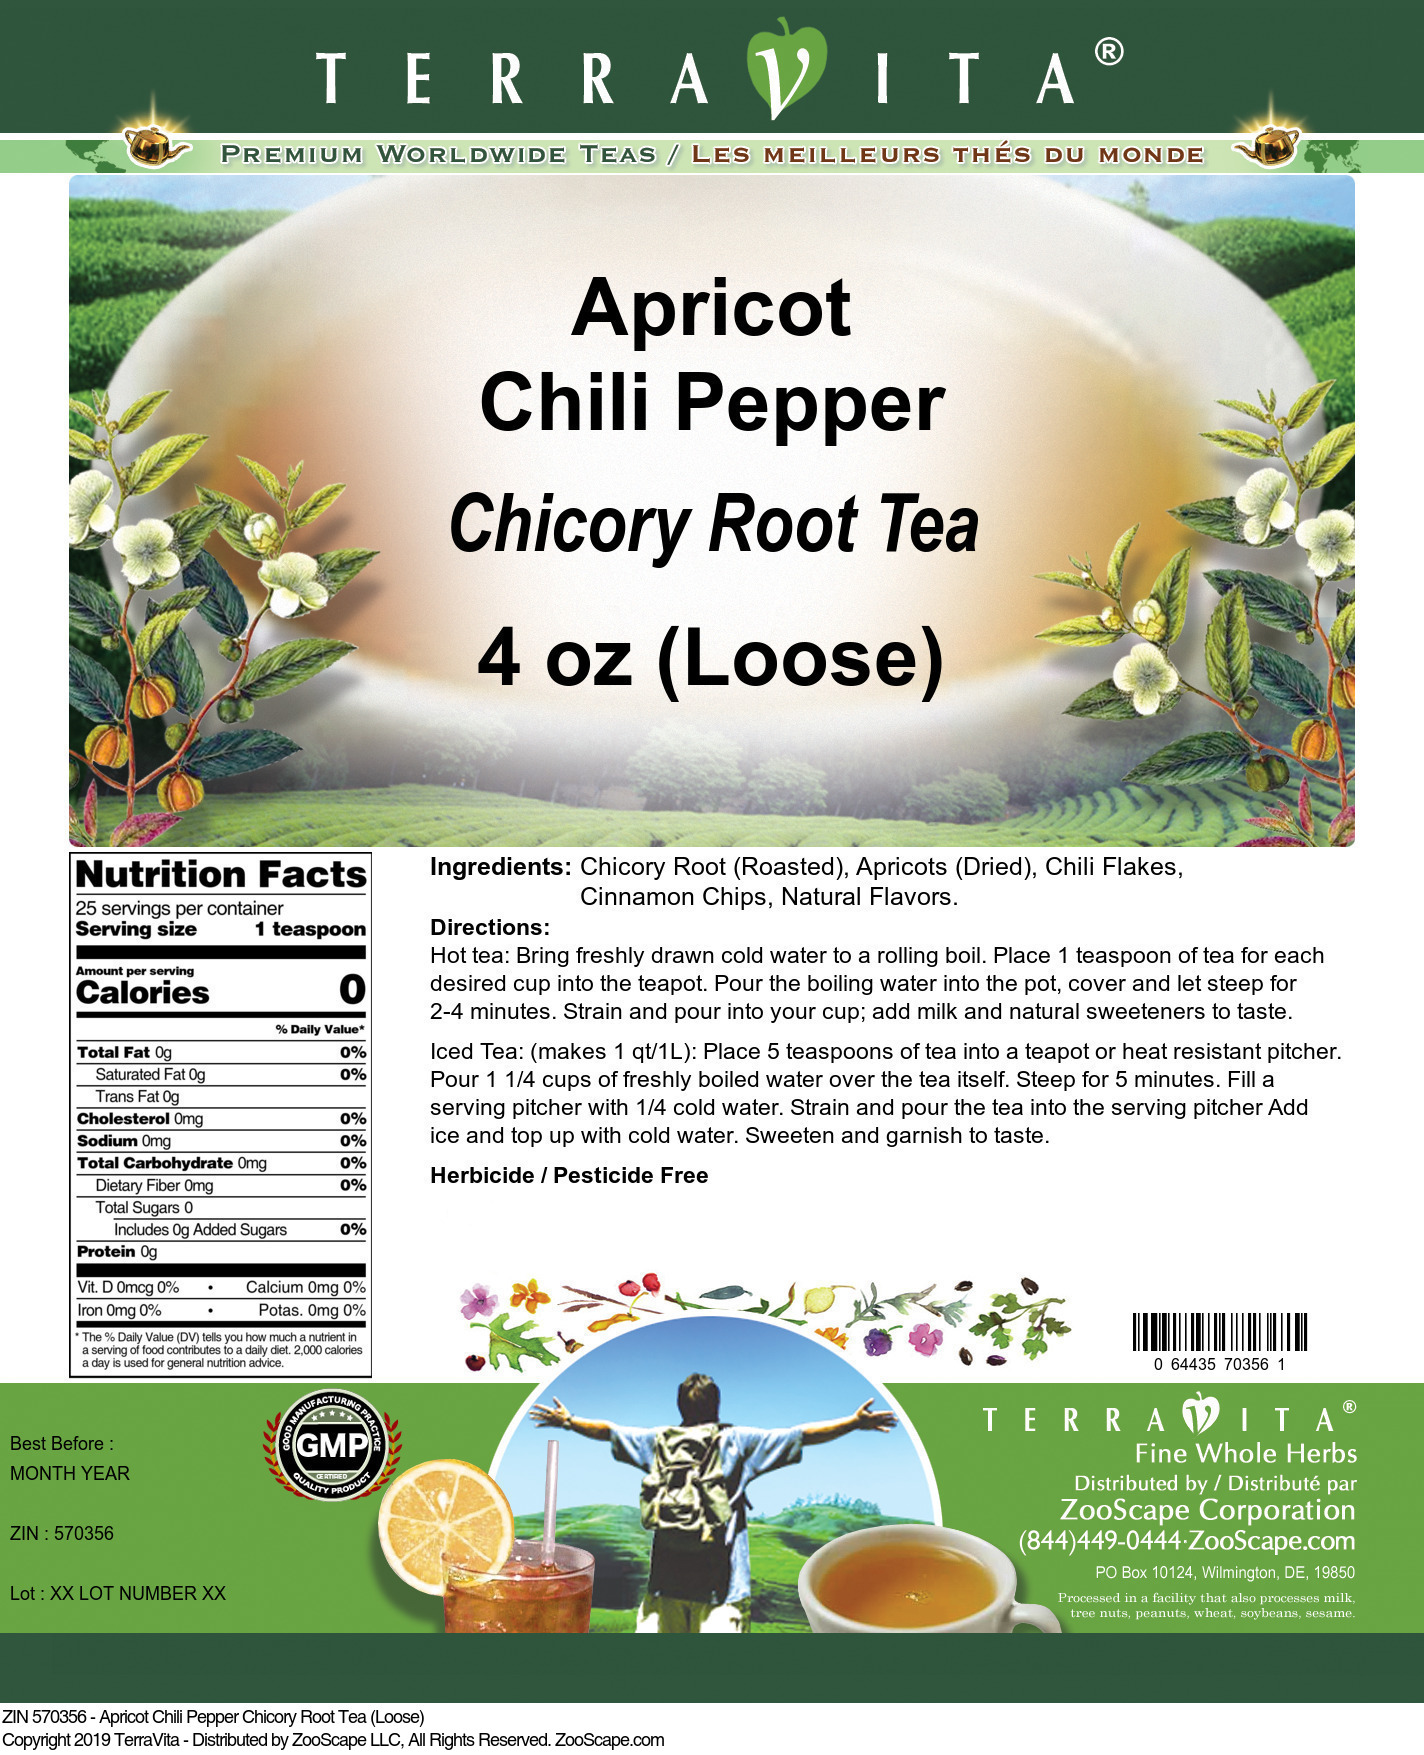 Apricot Chili Pepper Chicory Root